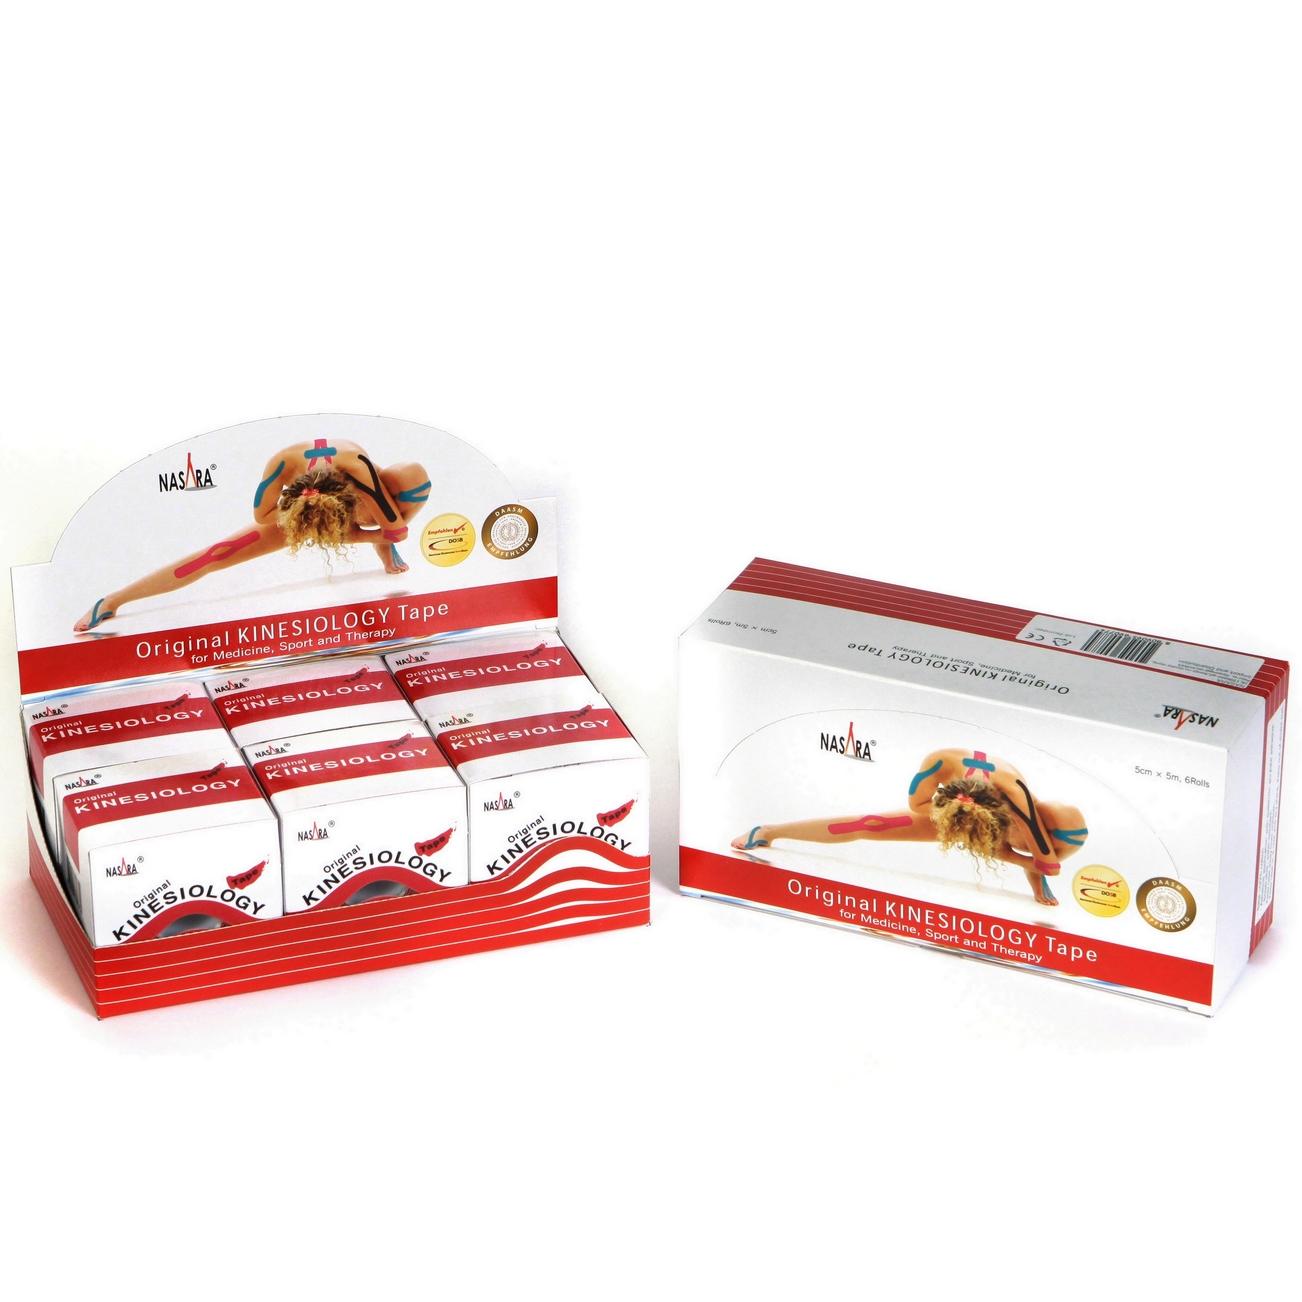 Nasara Kinesiology Tape 6er Box - Rot